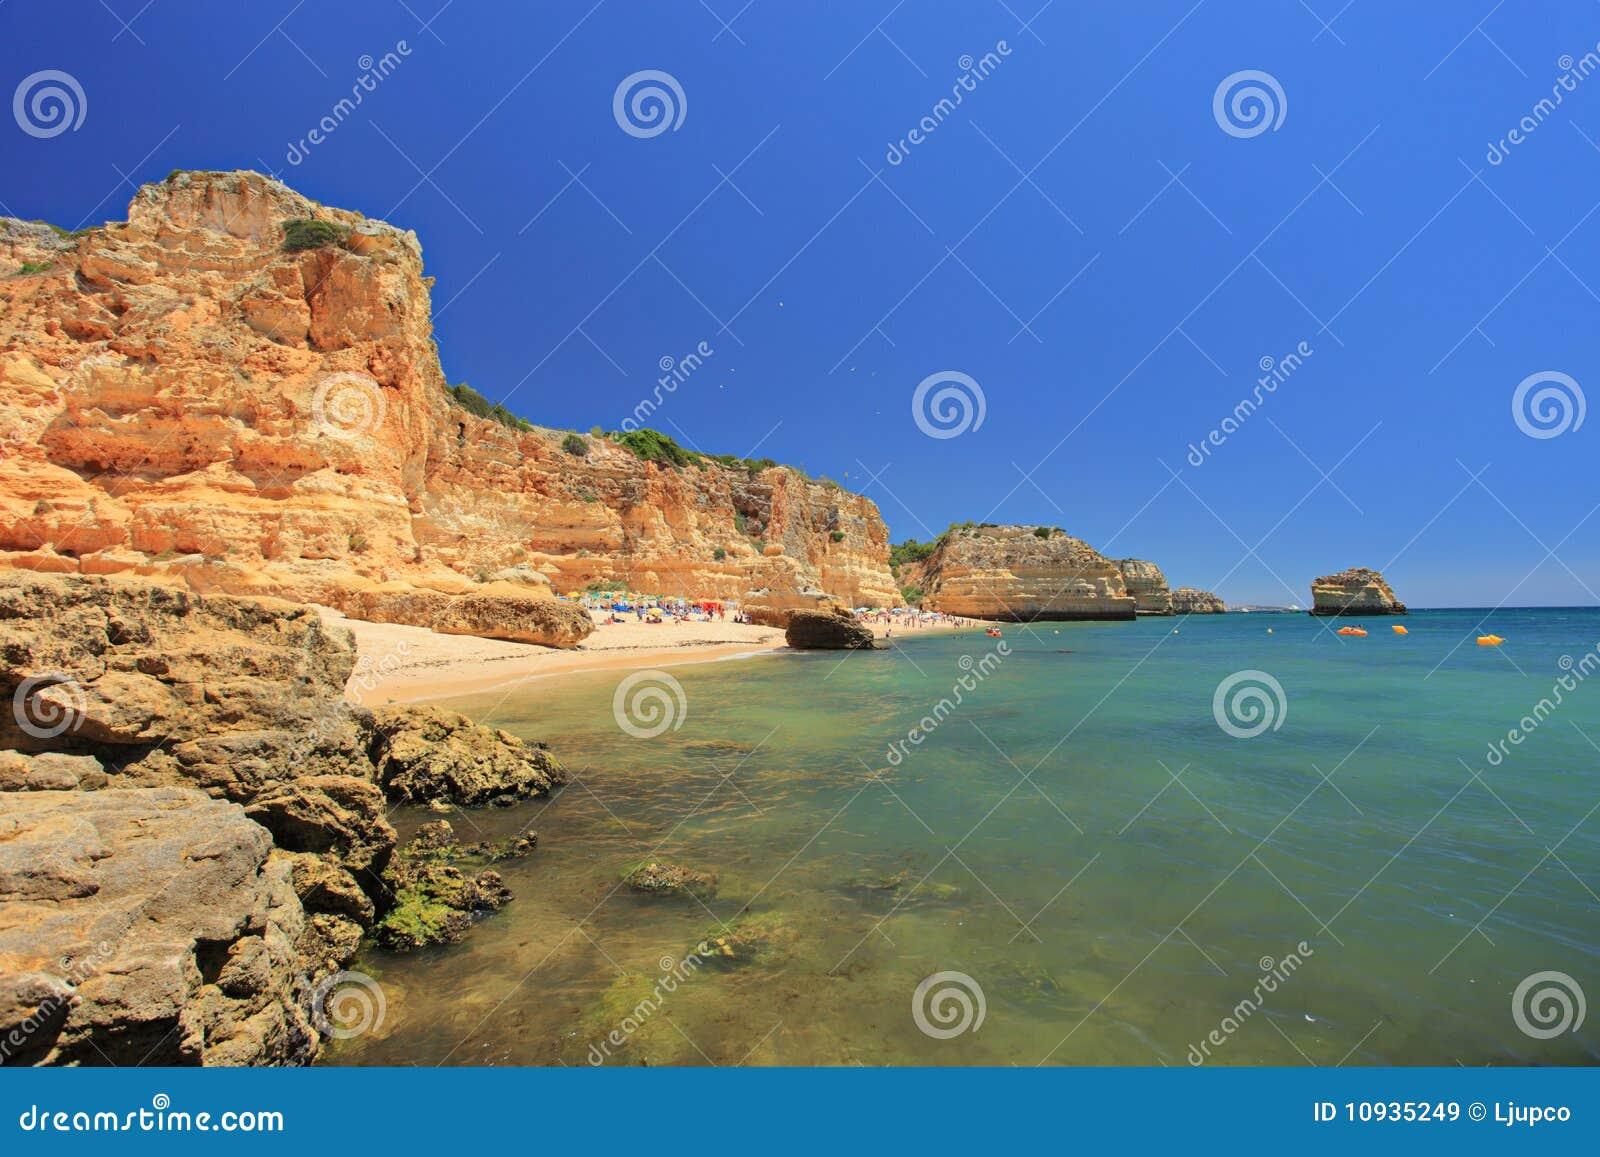 Praia marinha da пляжа algarve